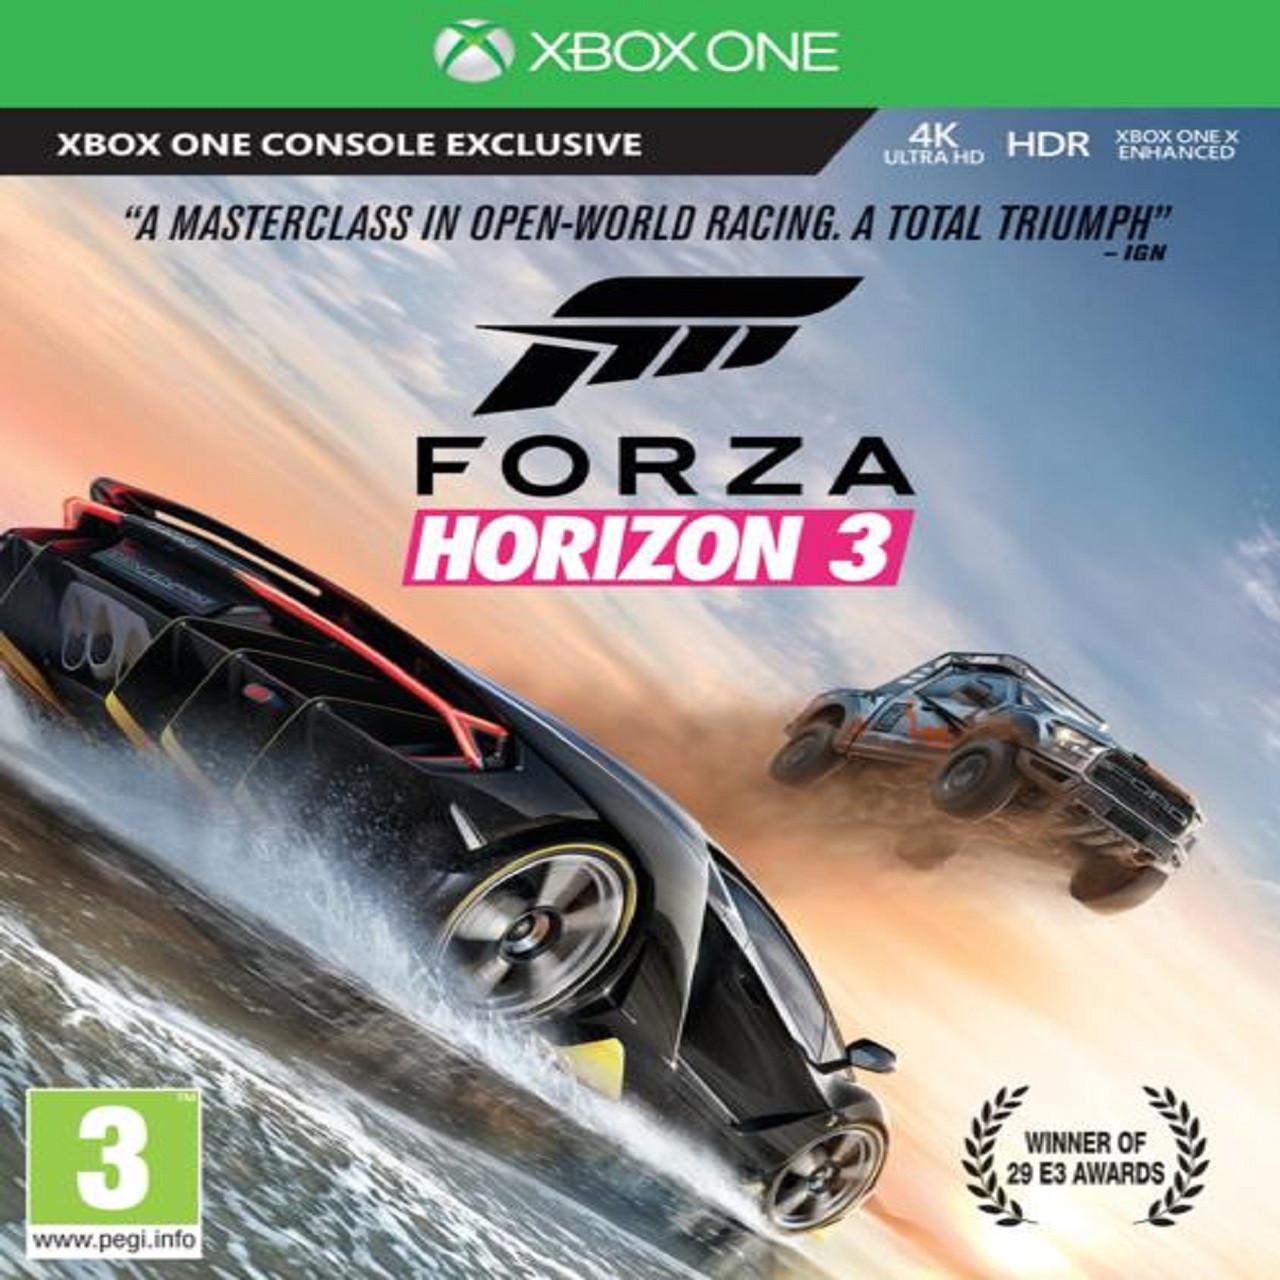 Forza Horizon 3 RUS XBOX ONE (Код)